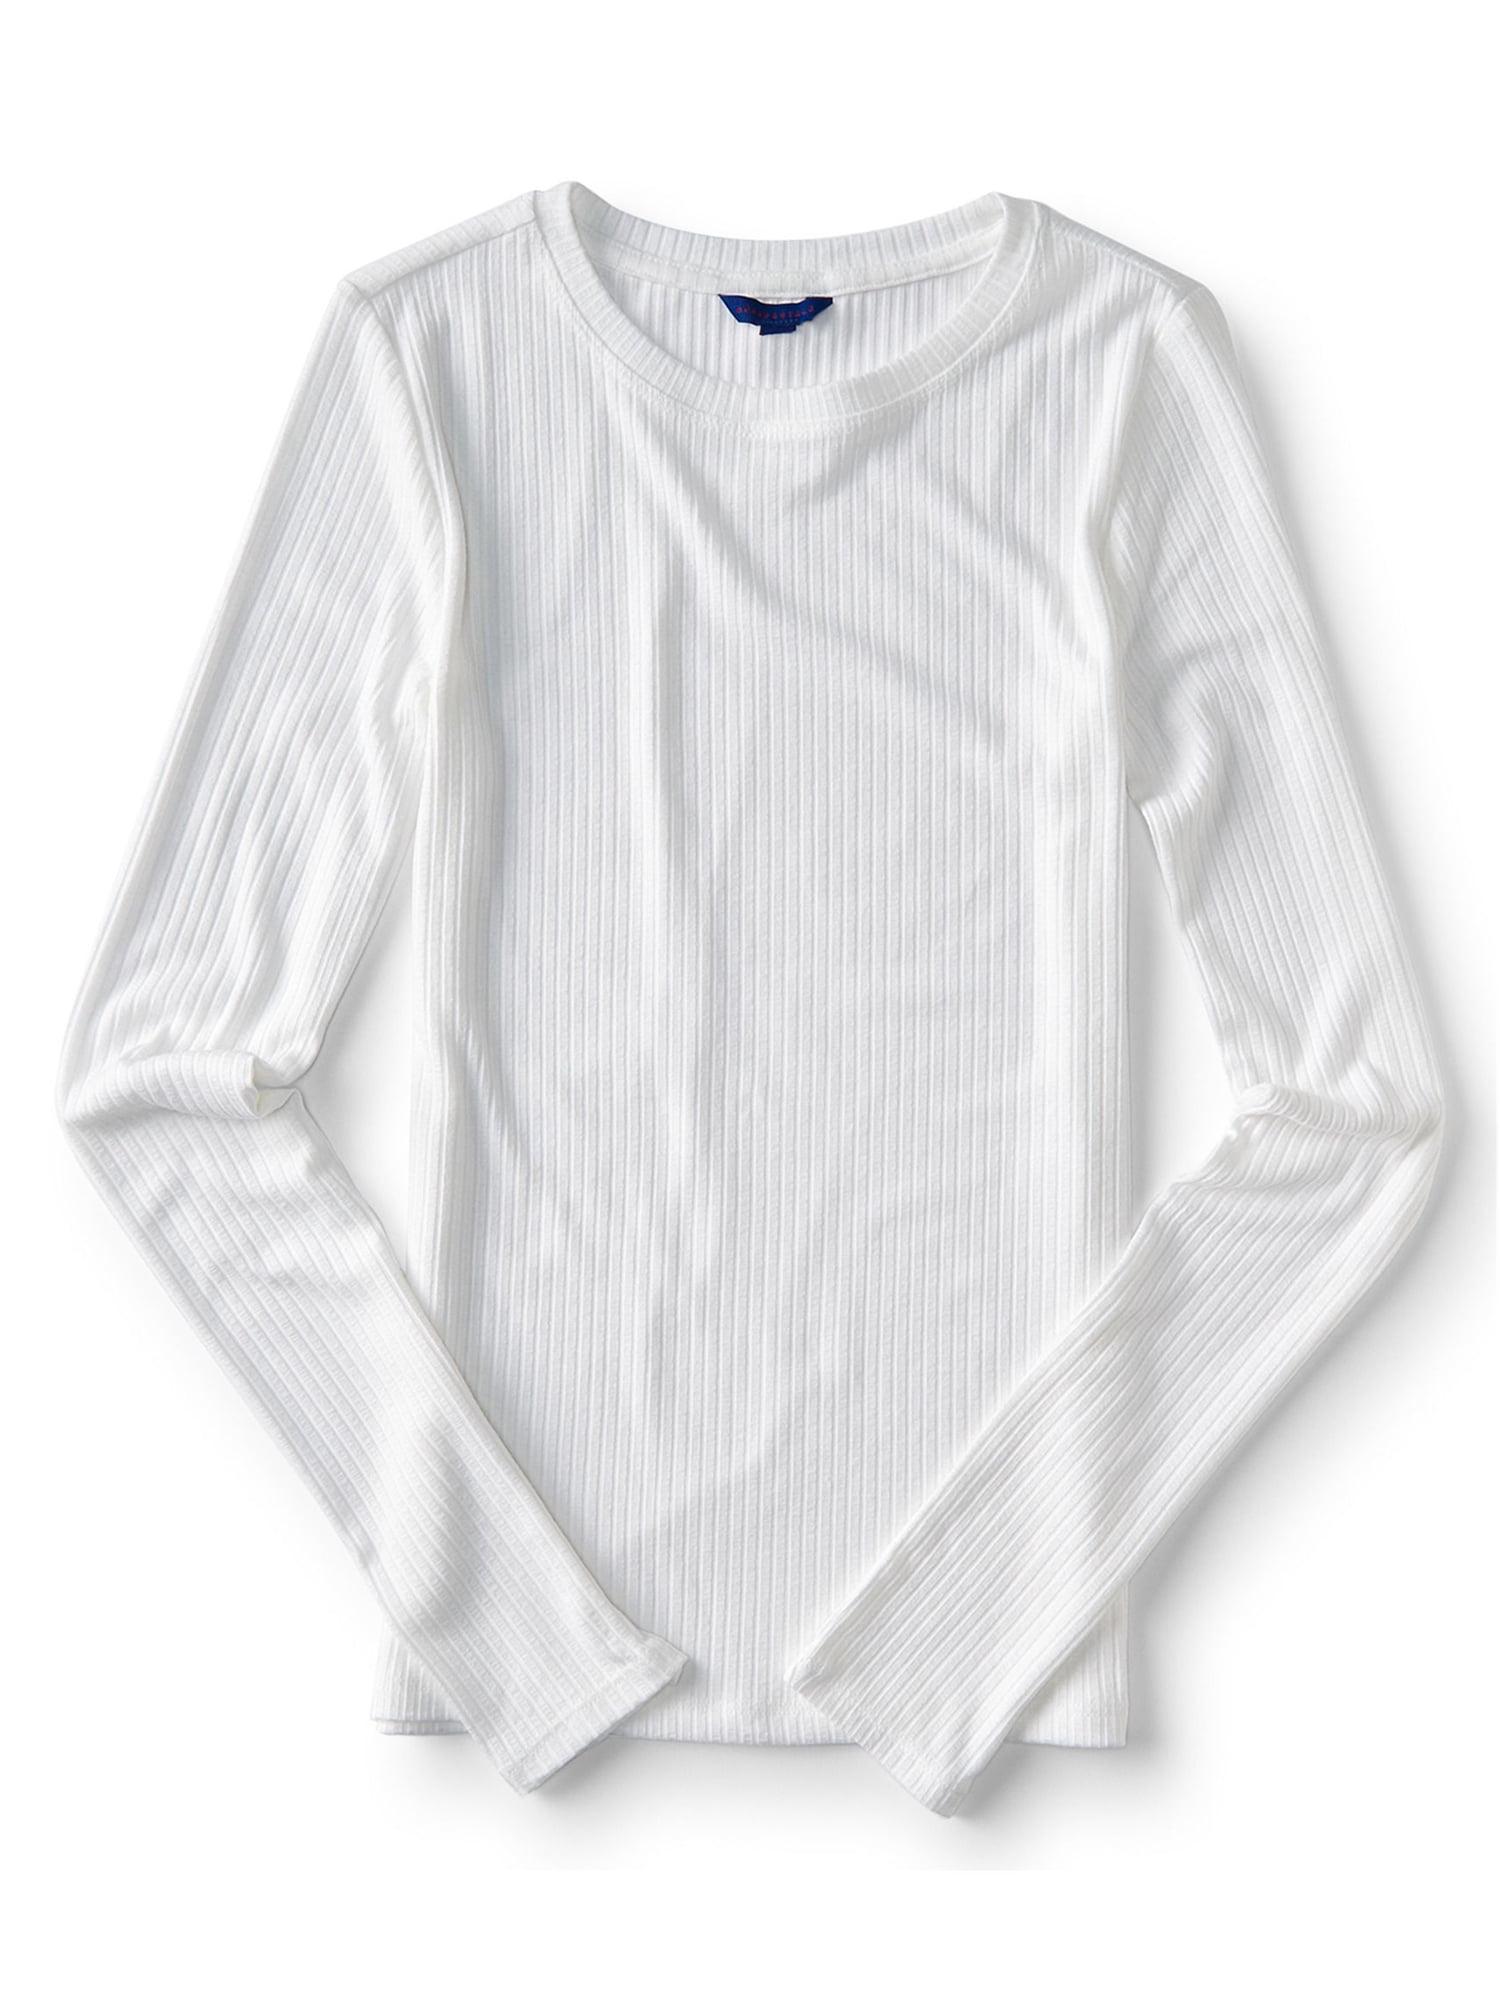 4a8fcbe0 Aeropostale Juniors Seriously Soft Ribbed Basic T-Shirt 102 Xl - Juniors